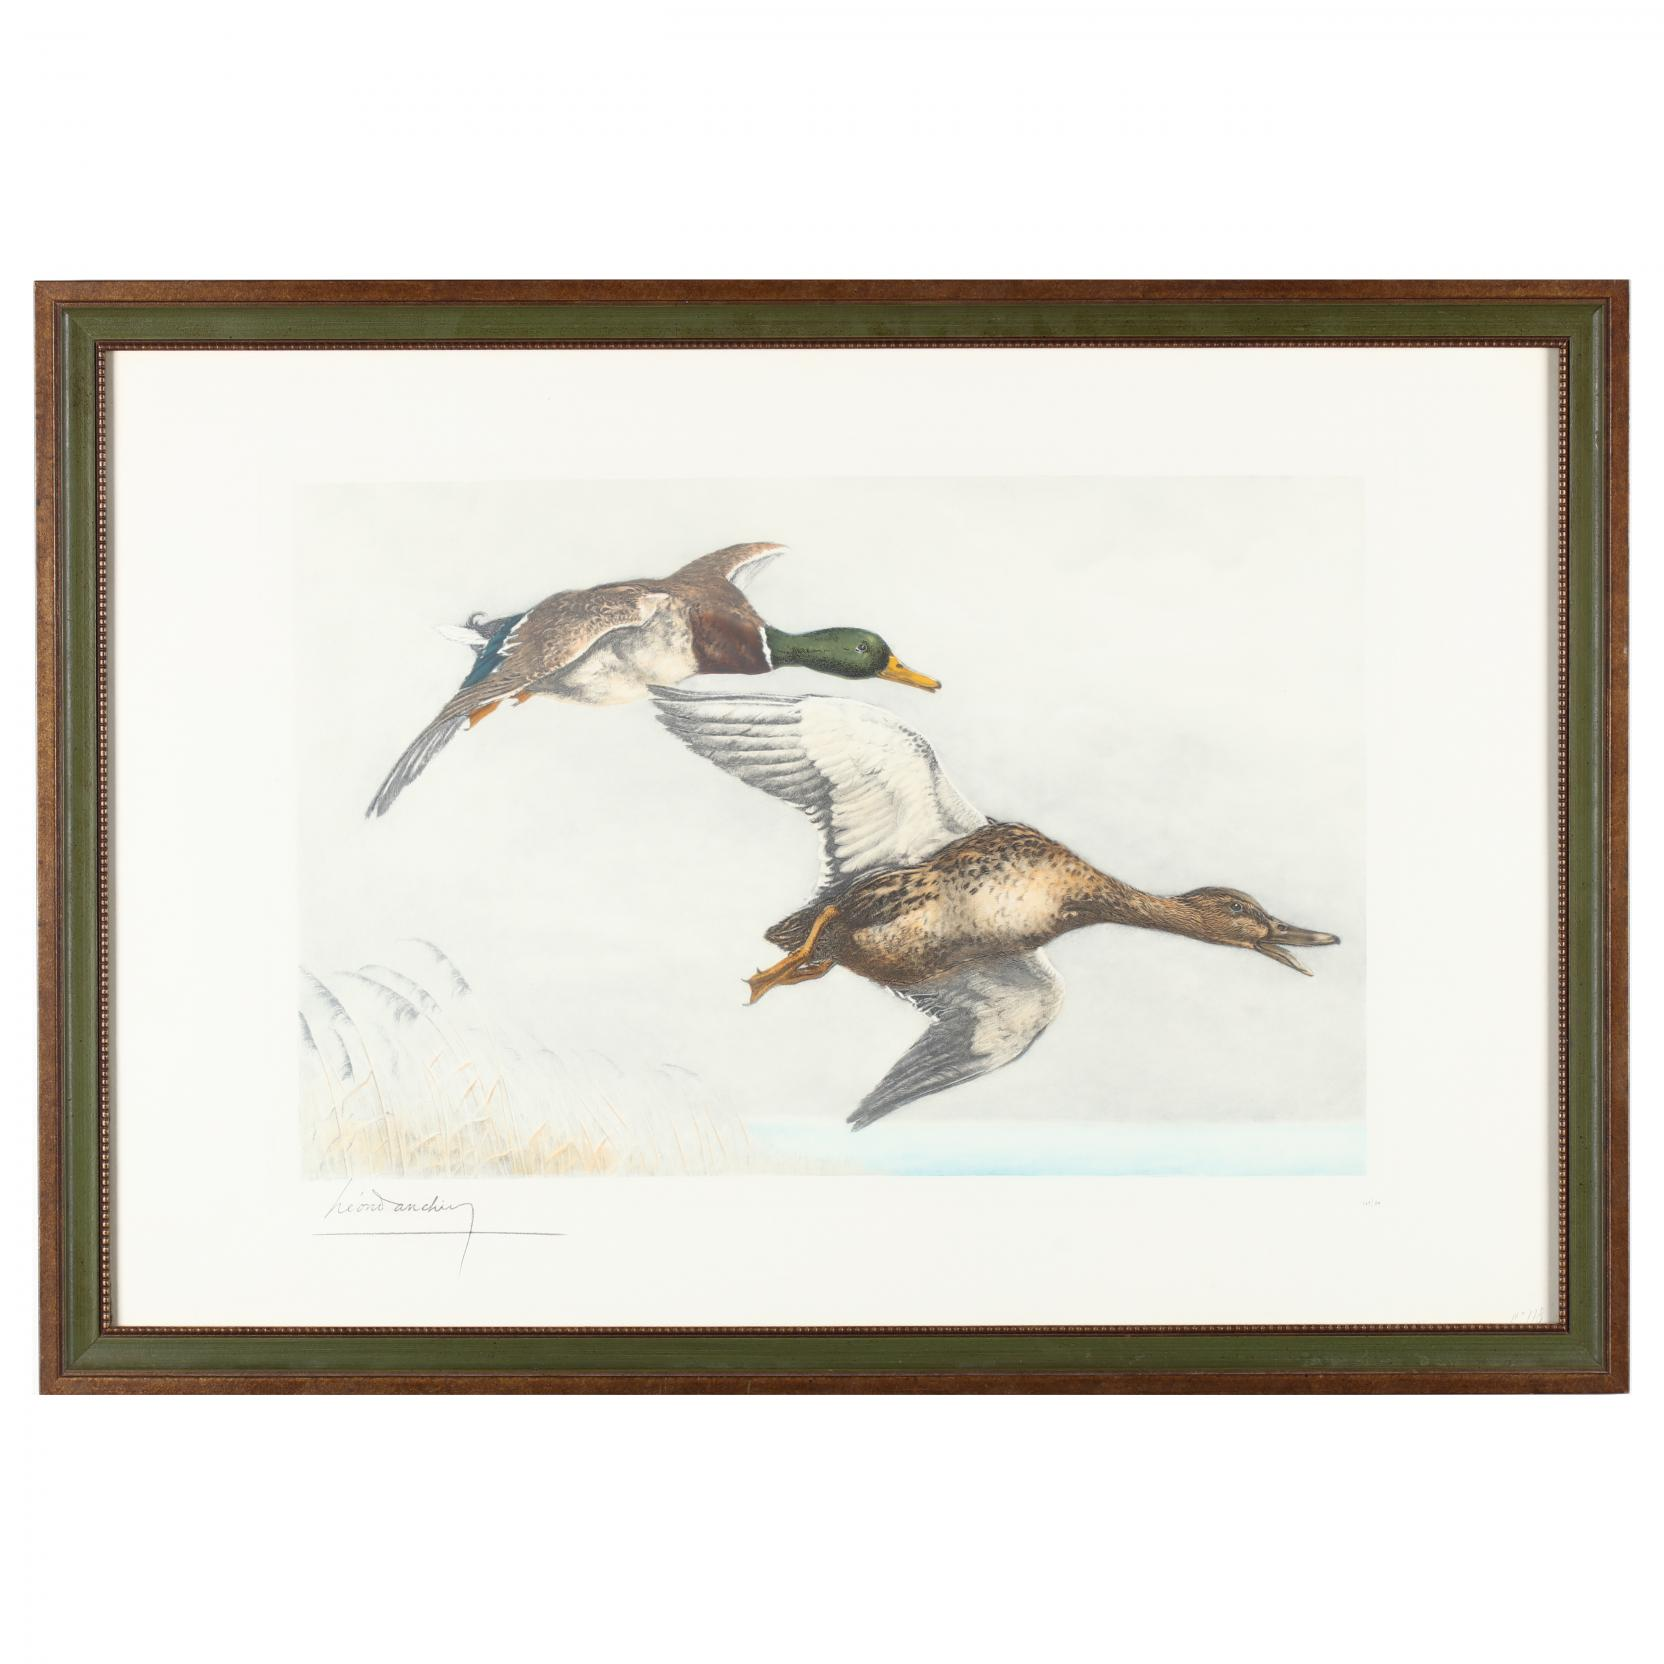 leon-danchin-french-1887-1939-two-ducks-in-flight-over-marsh